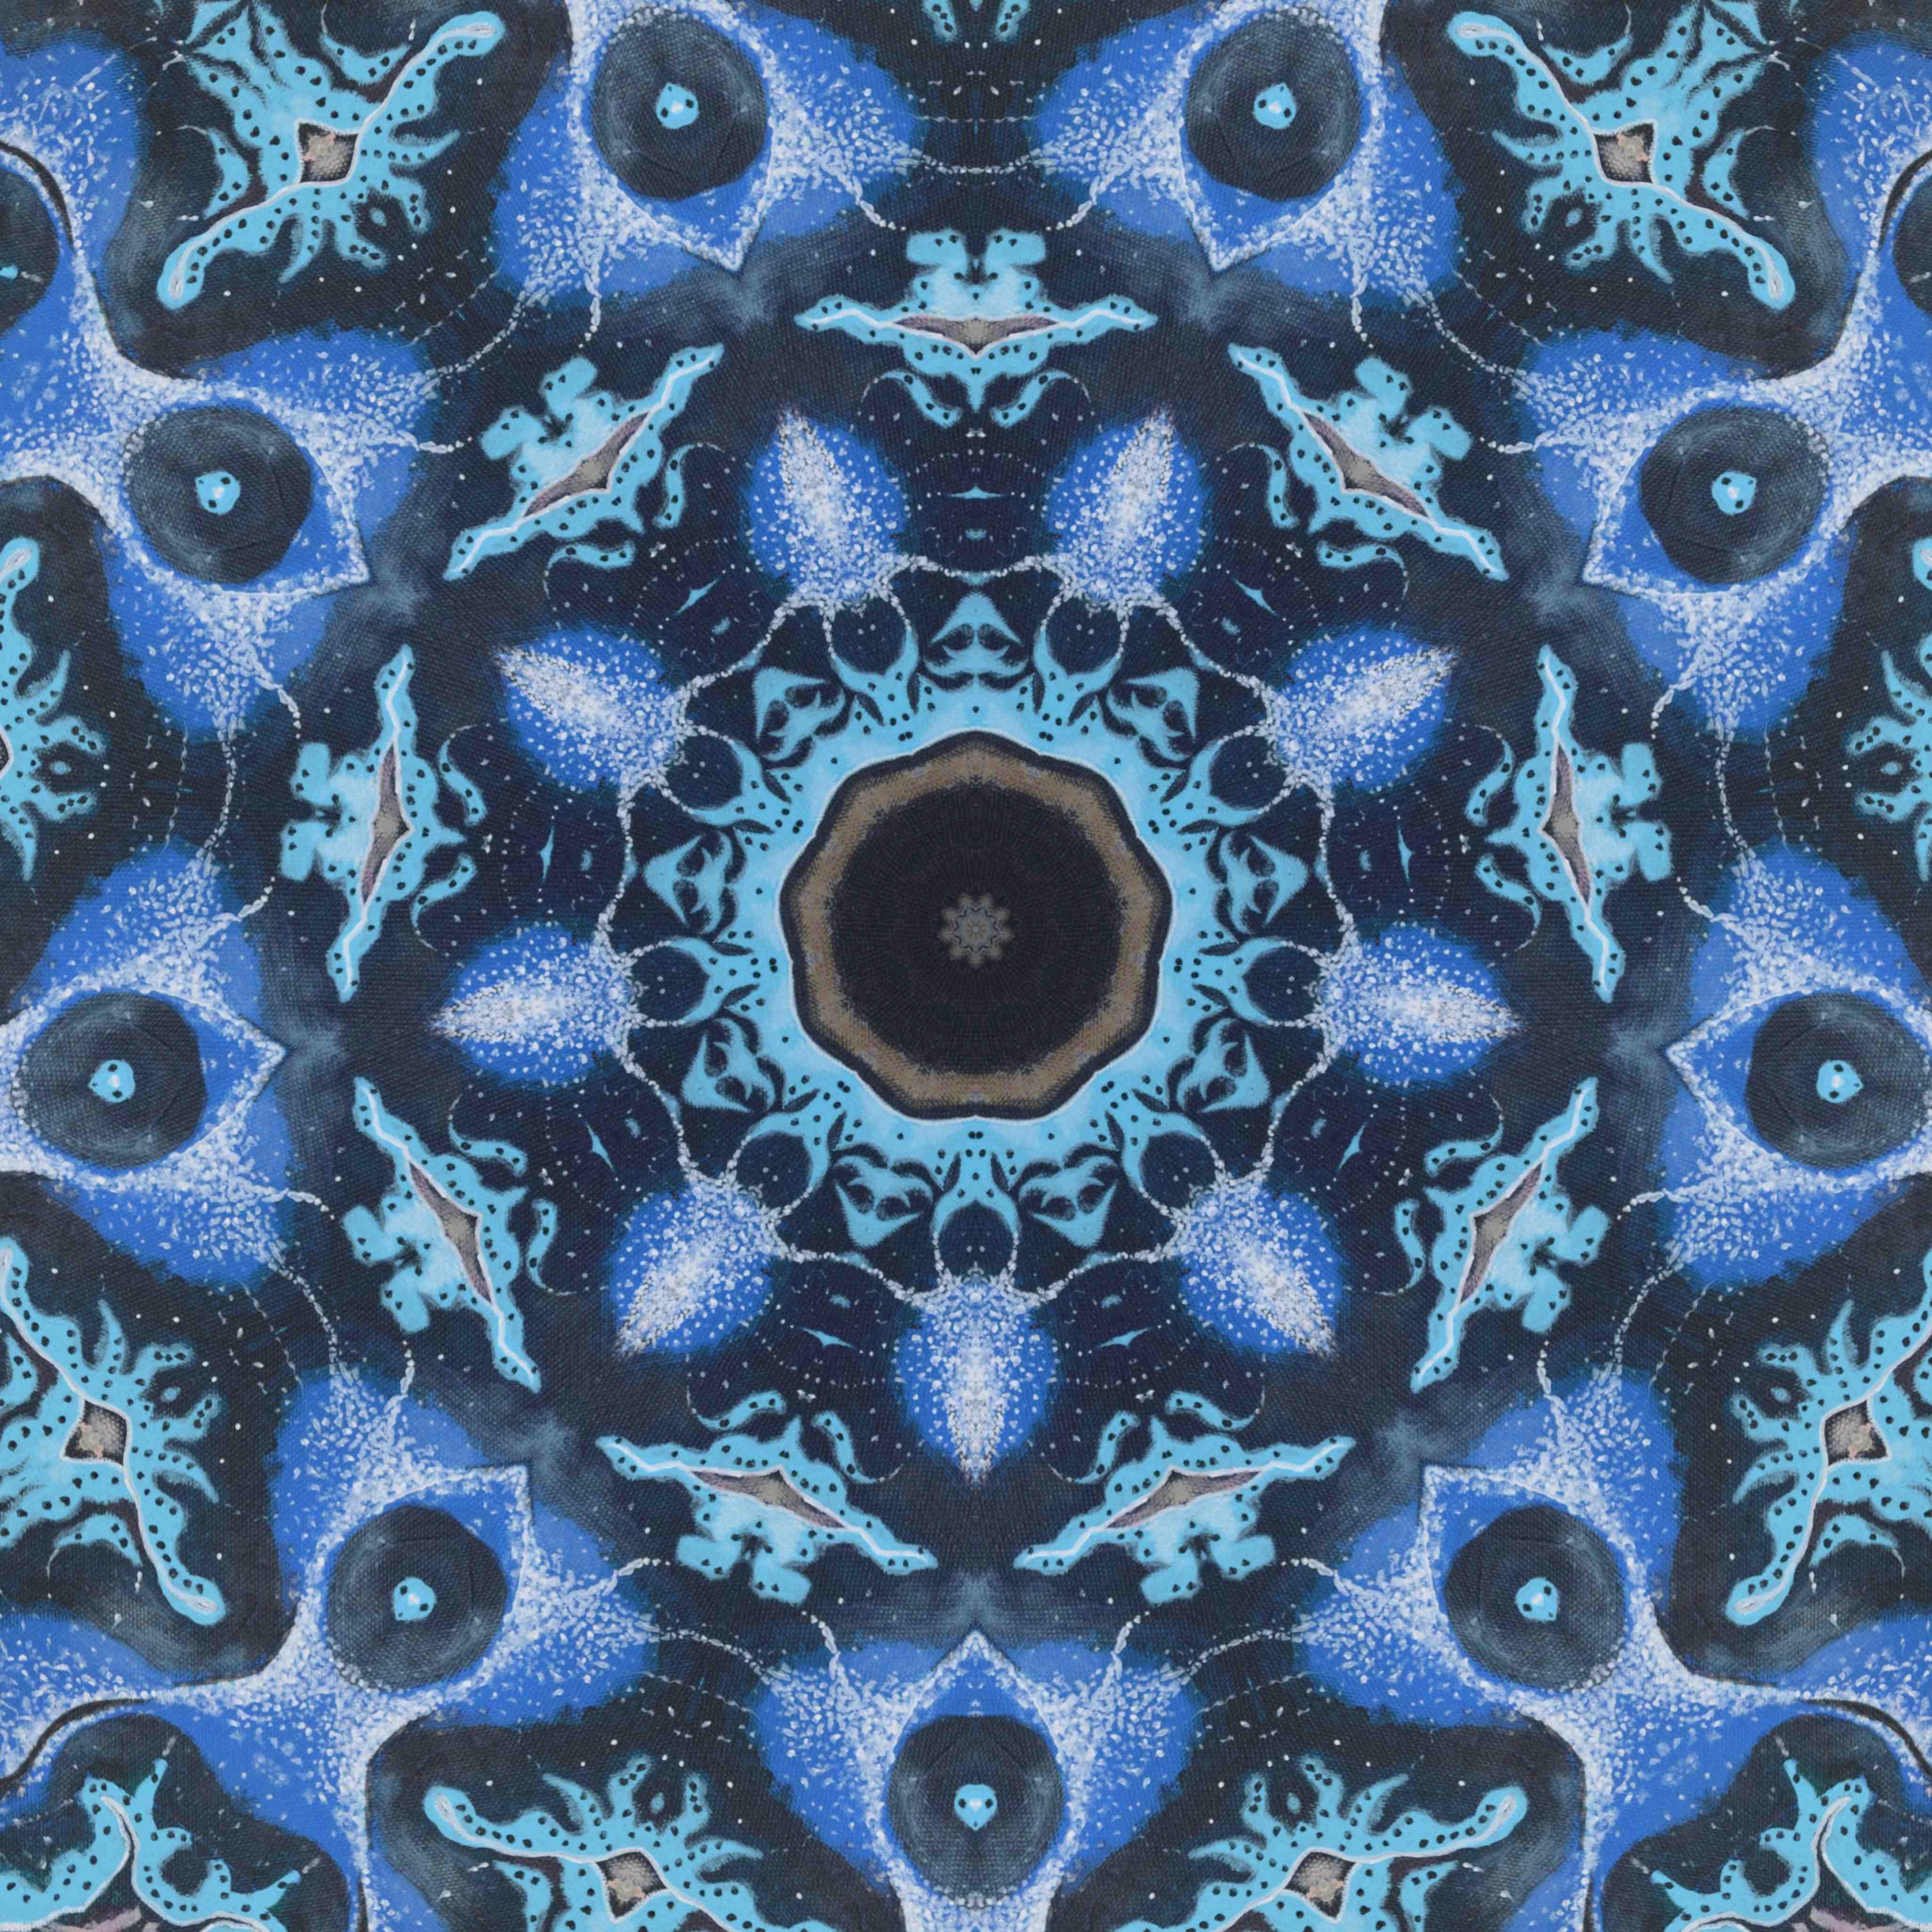 Fabric design GC  #1_5i.jpg